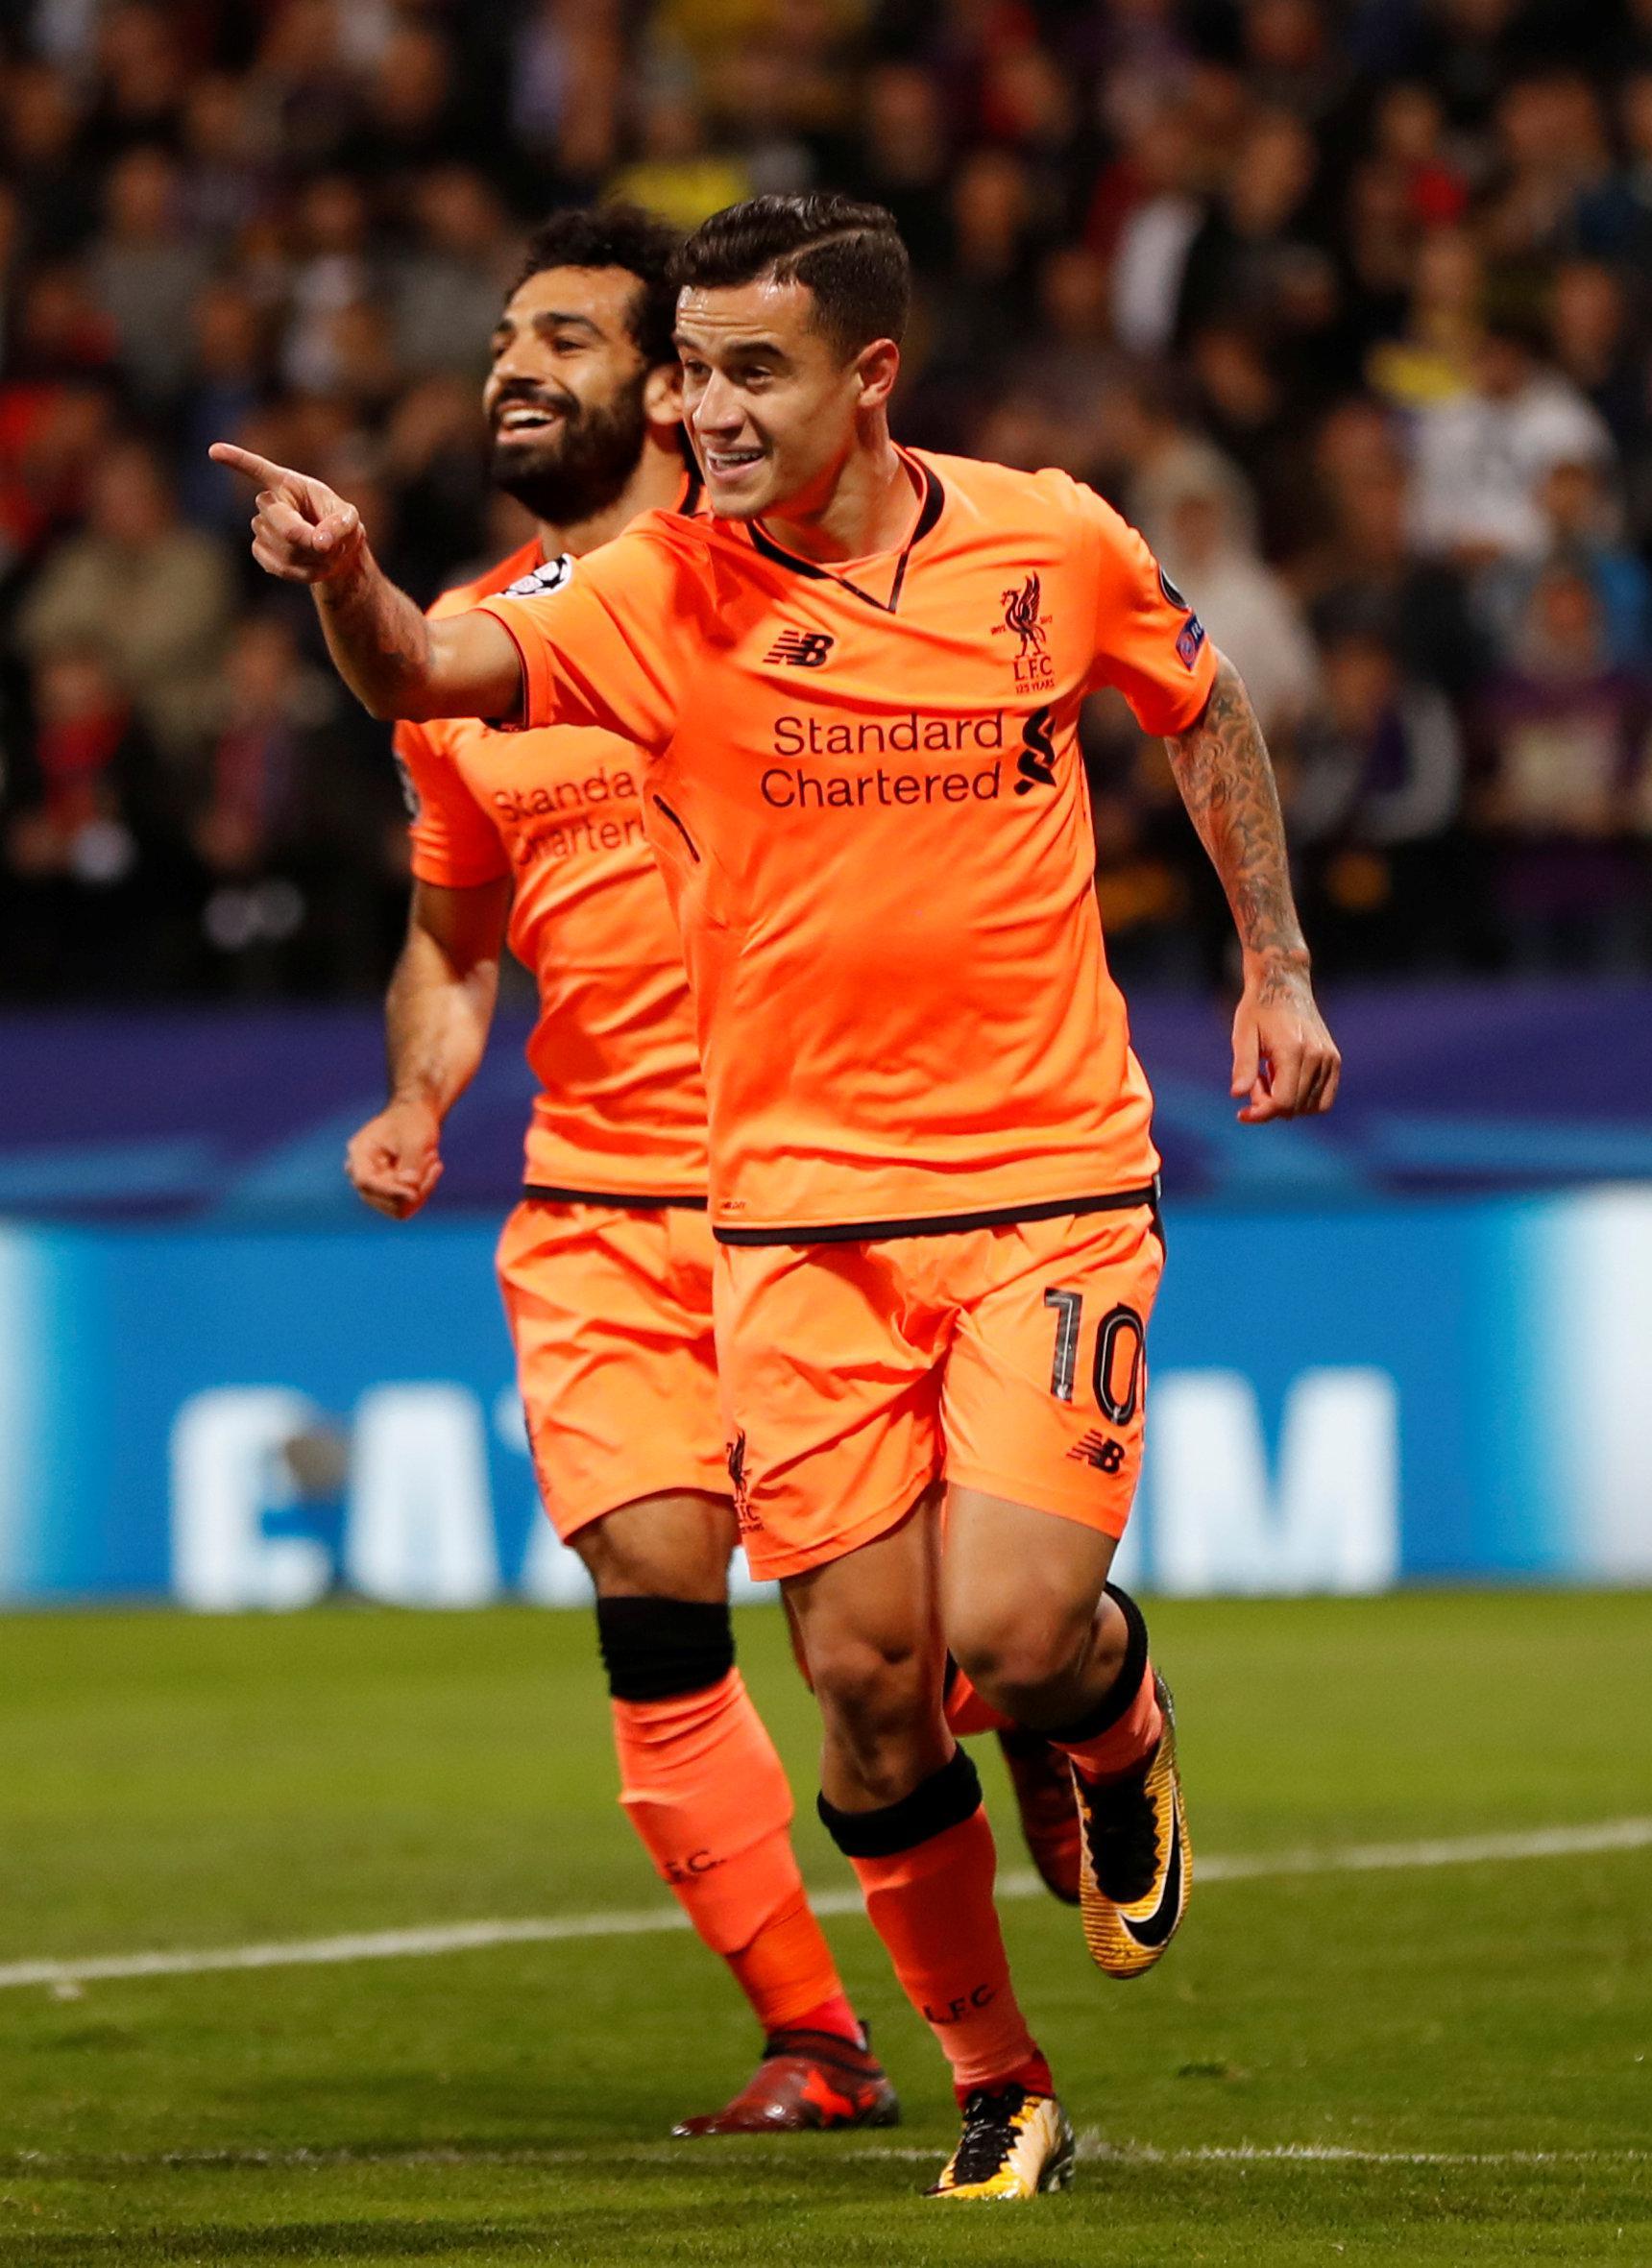 Liverpool Tottenham Final Streaming : liverpool, tottenham, final, streaming, Tottenham, Liverpool:, Channel,, Stream,, News,, Kick-off, Premier, League, Clash, Wembley